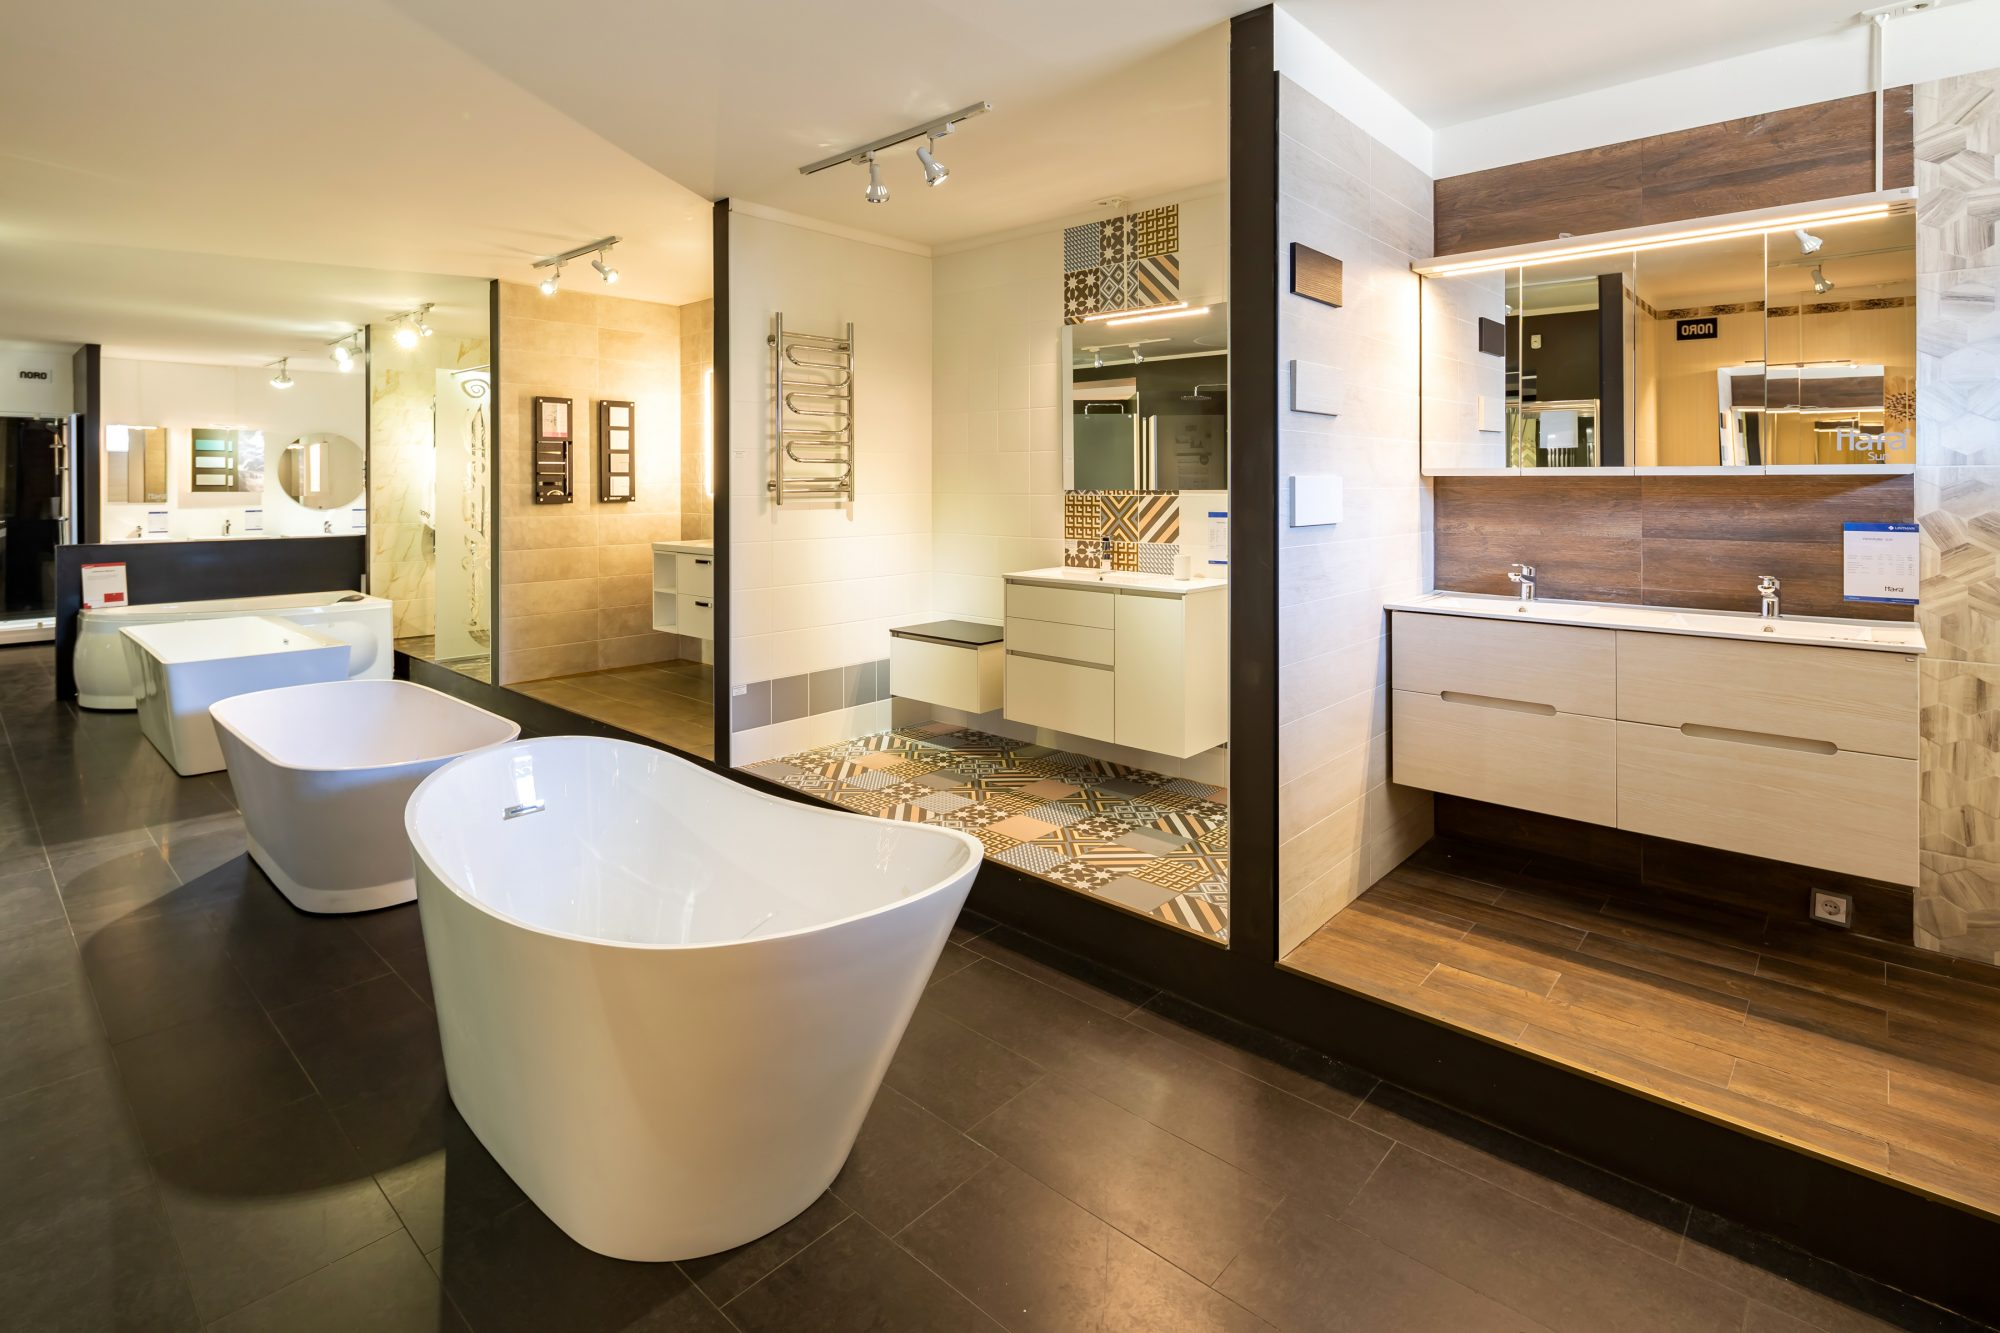 vannitoad, LINTMAN salong Tallinnas